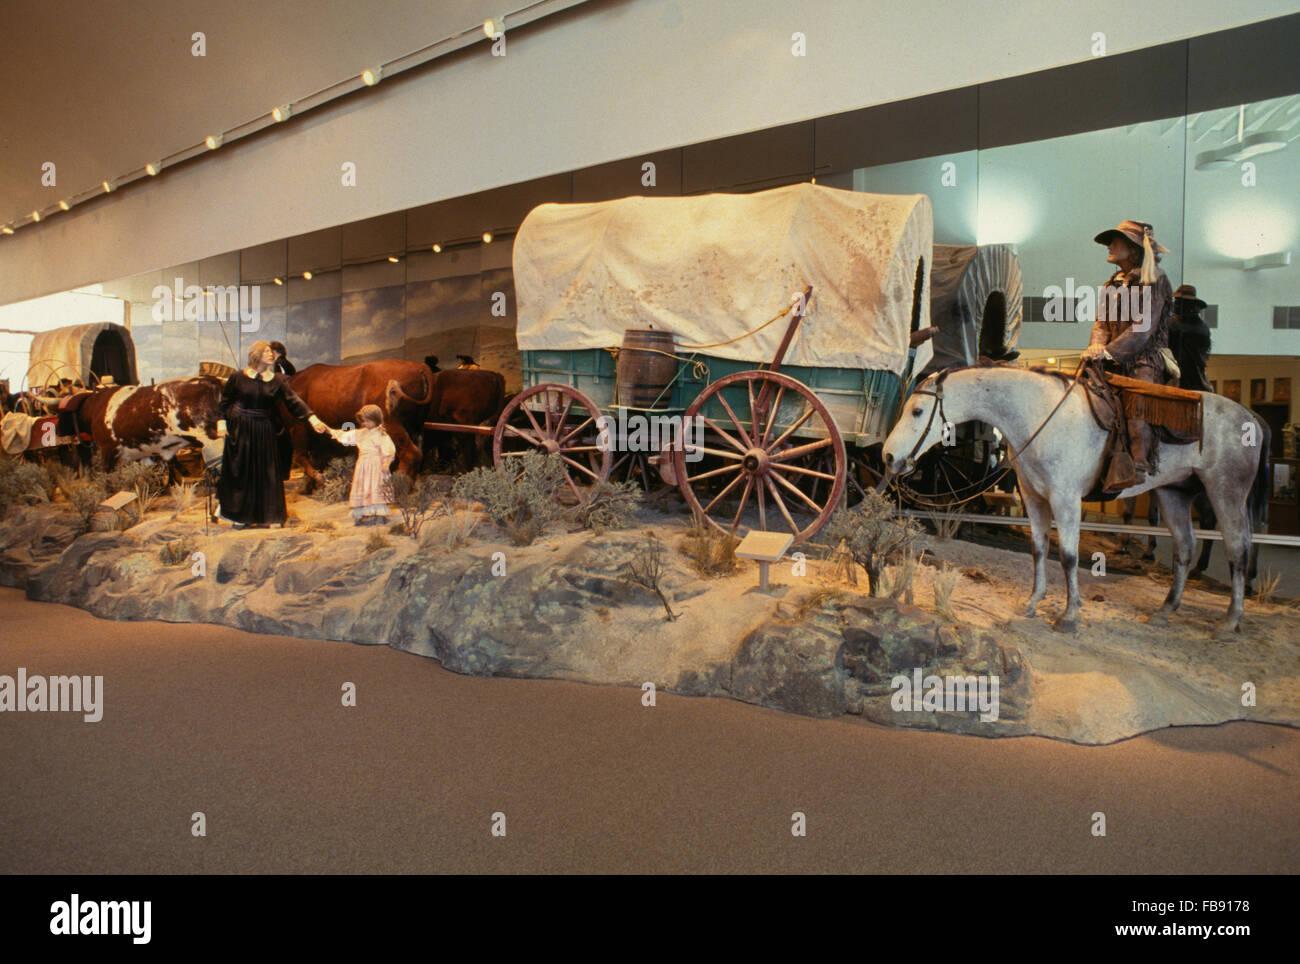 Oregon Trail Interpretive Center exhibit at Flagstaff Hill, near Baker City in eastern Oregon. - Stock Image